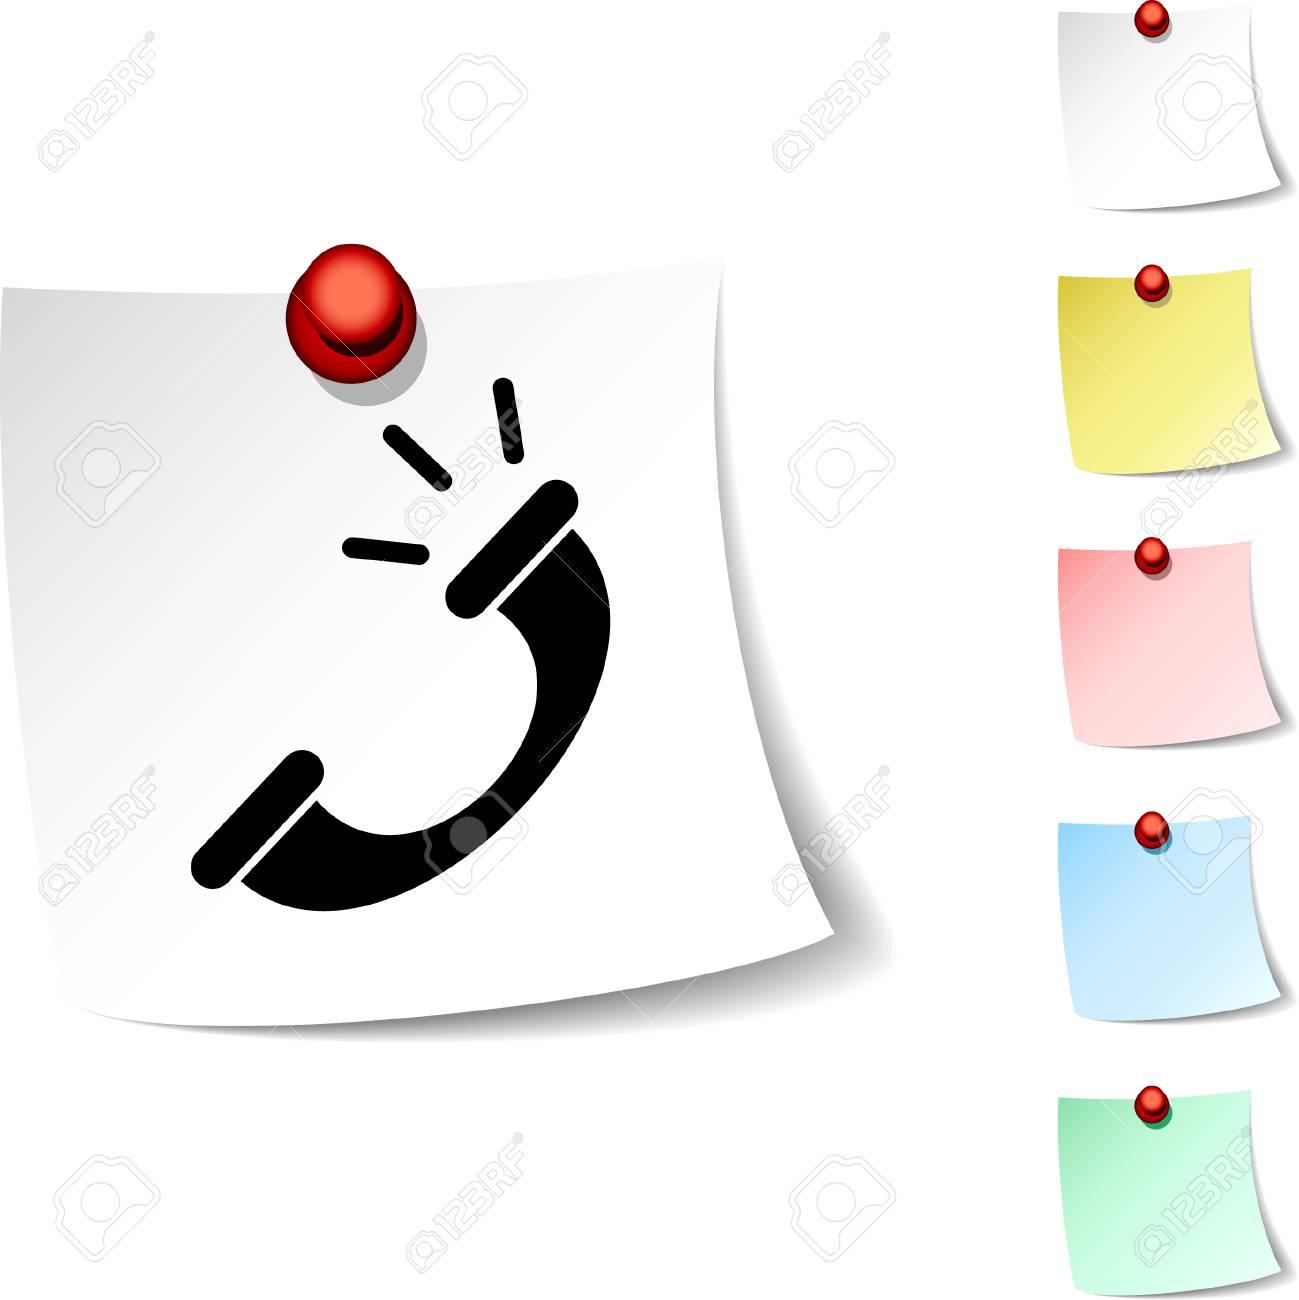 Telephone  sheet icon. Vector illustration. Stock Vector - 5560268